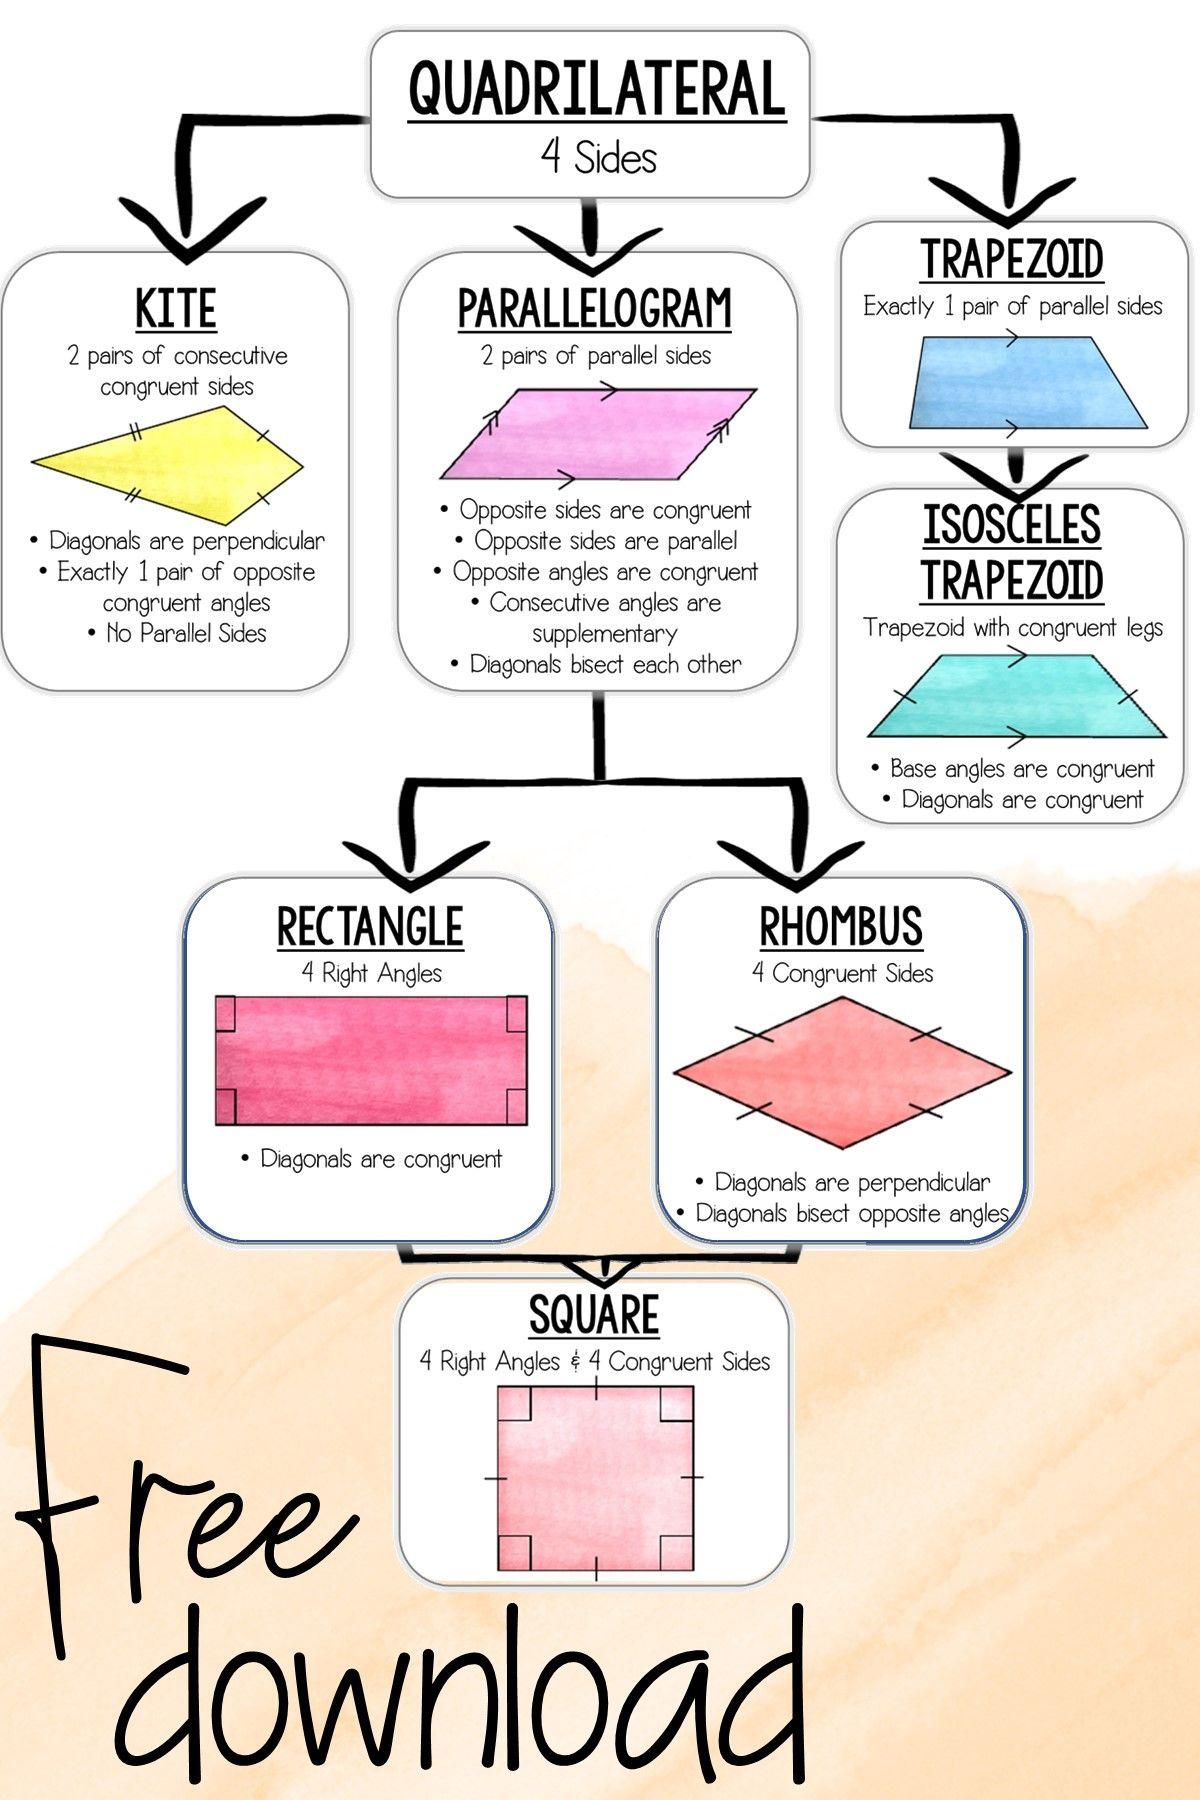 Free Classifying Quadrilaterals Anchor Chart In 2020 Quadrilaterals Anchor Chart Middle School Geometry Quadrilaterals